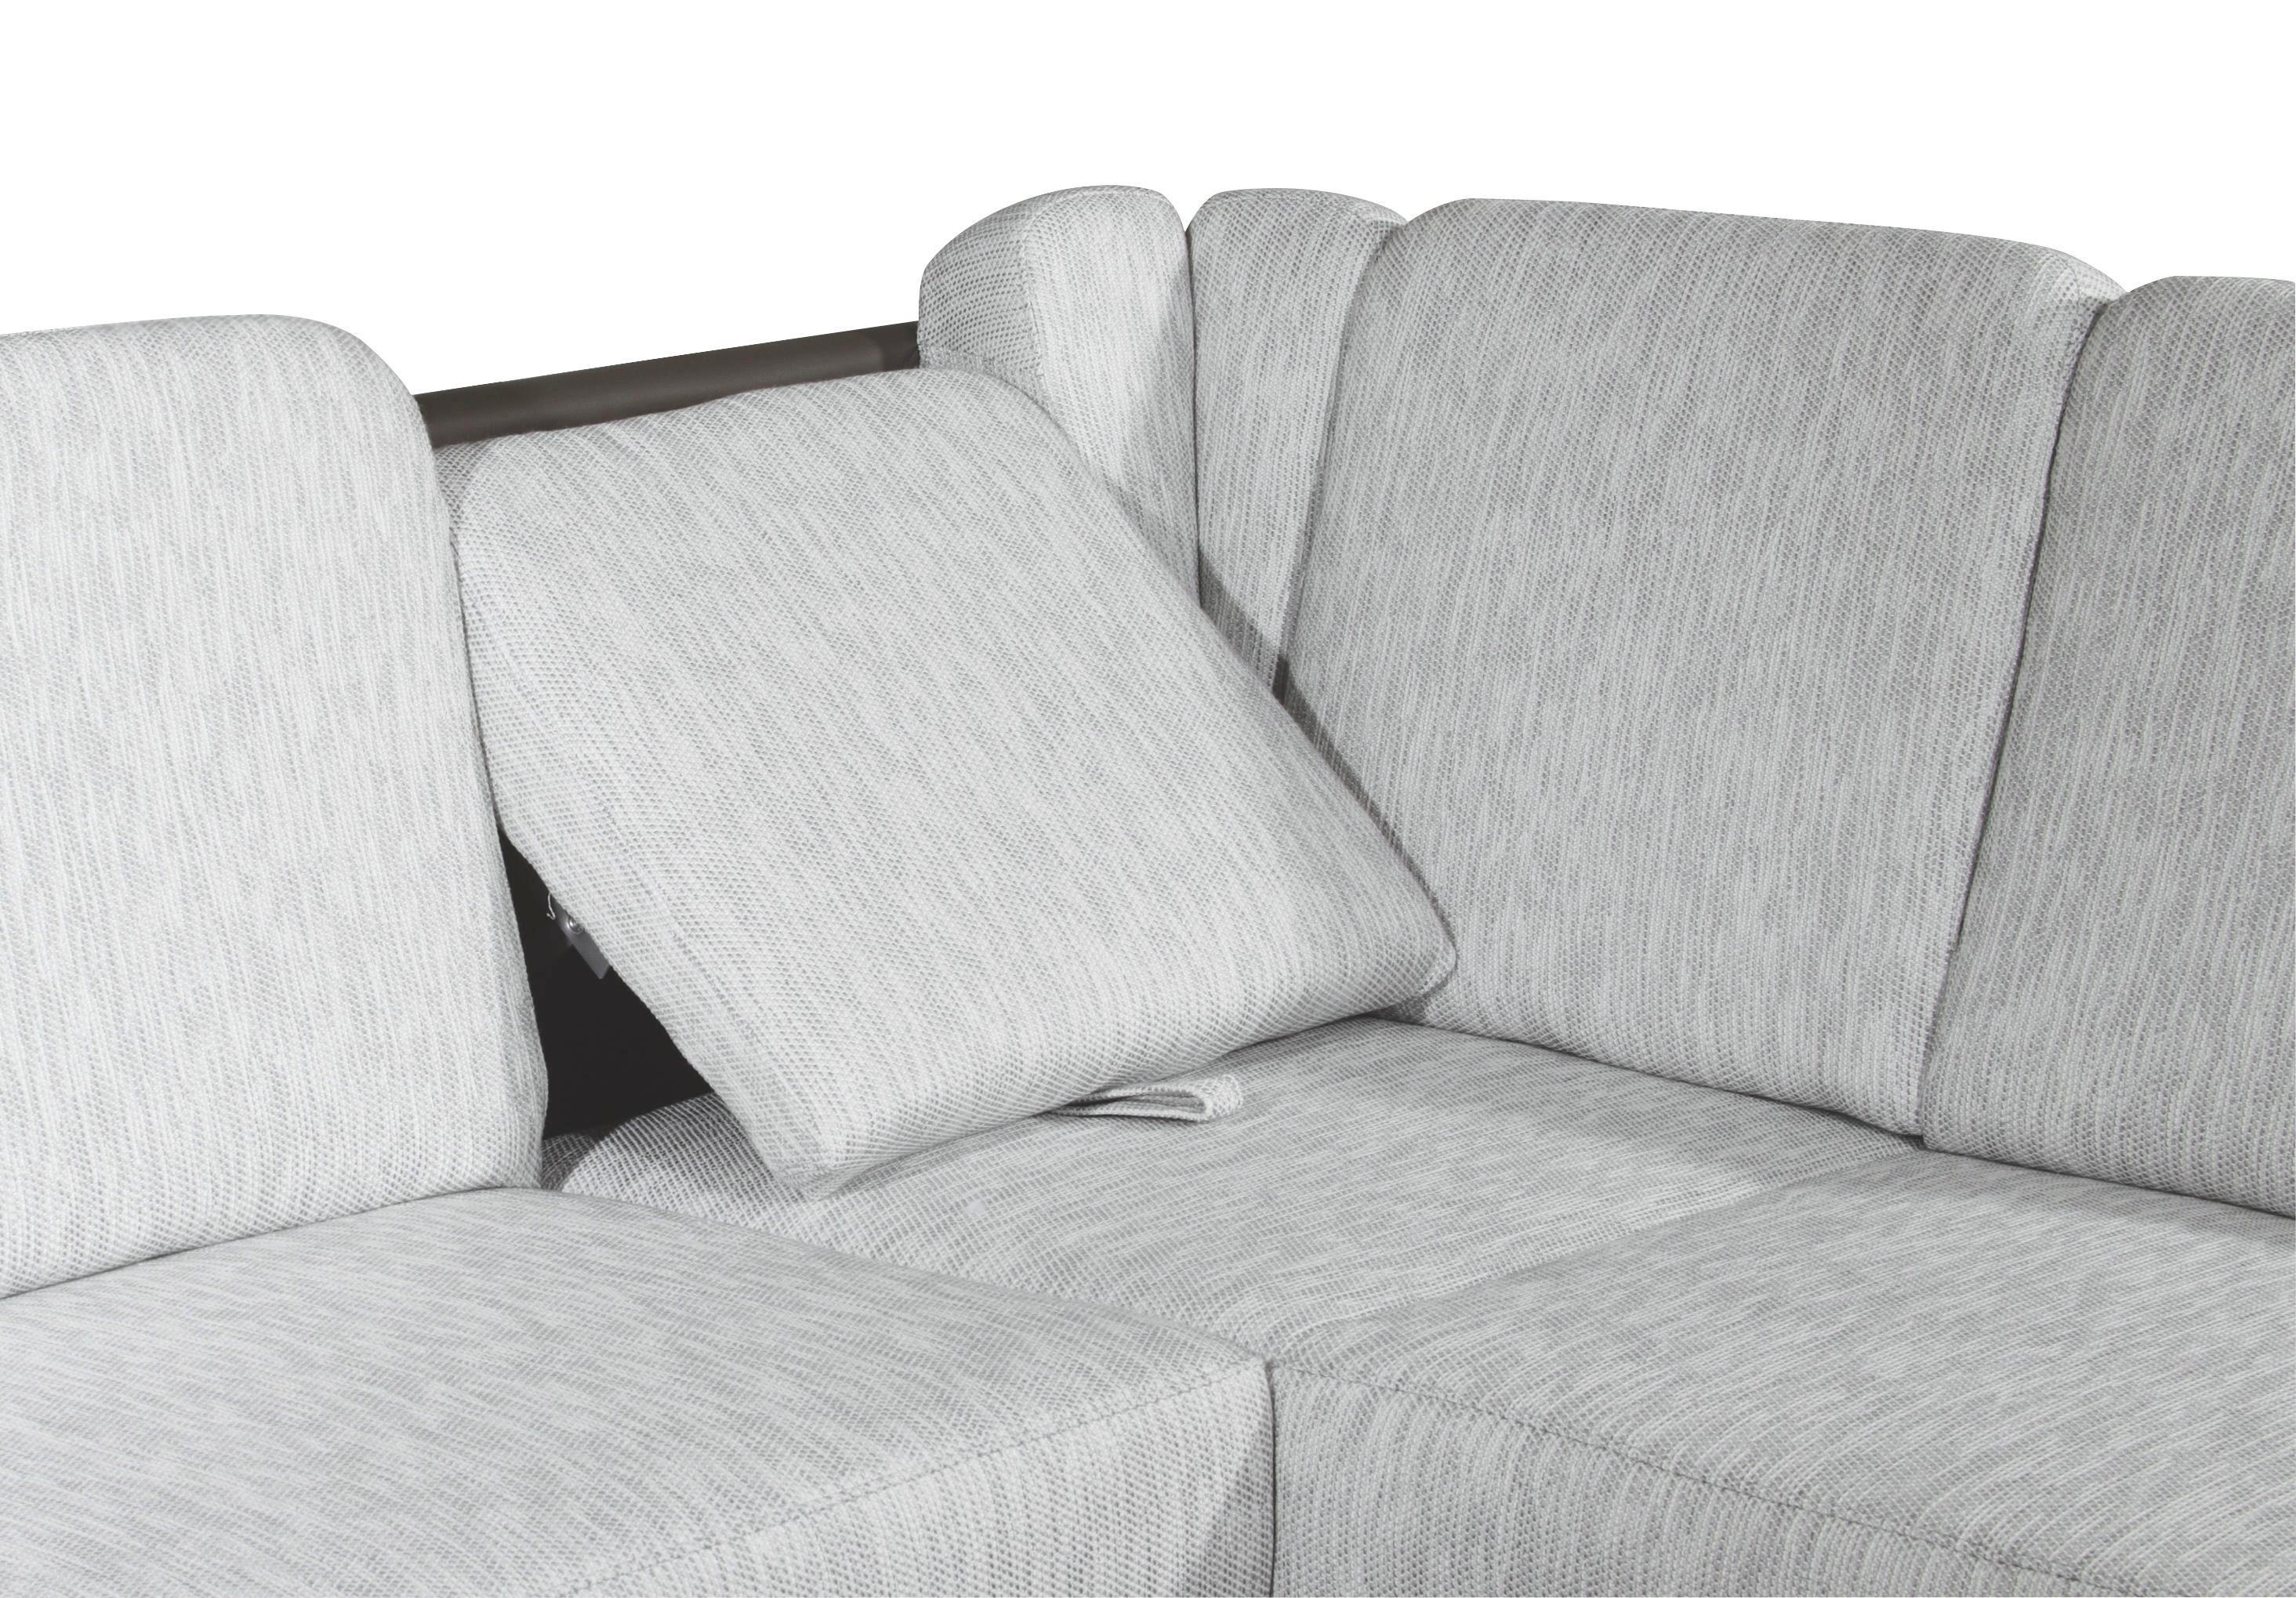 WOHNLANDSCHAFT in Dunkelbraun, Hellgrau Textil - Dunkelbraun/Hellgrau, KONVENTIONELL, Textil/Metall (245/200cm) - XORA